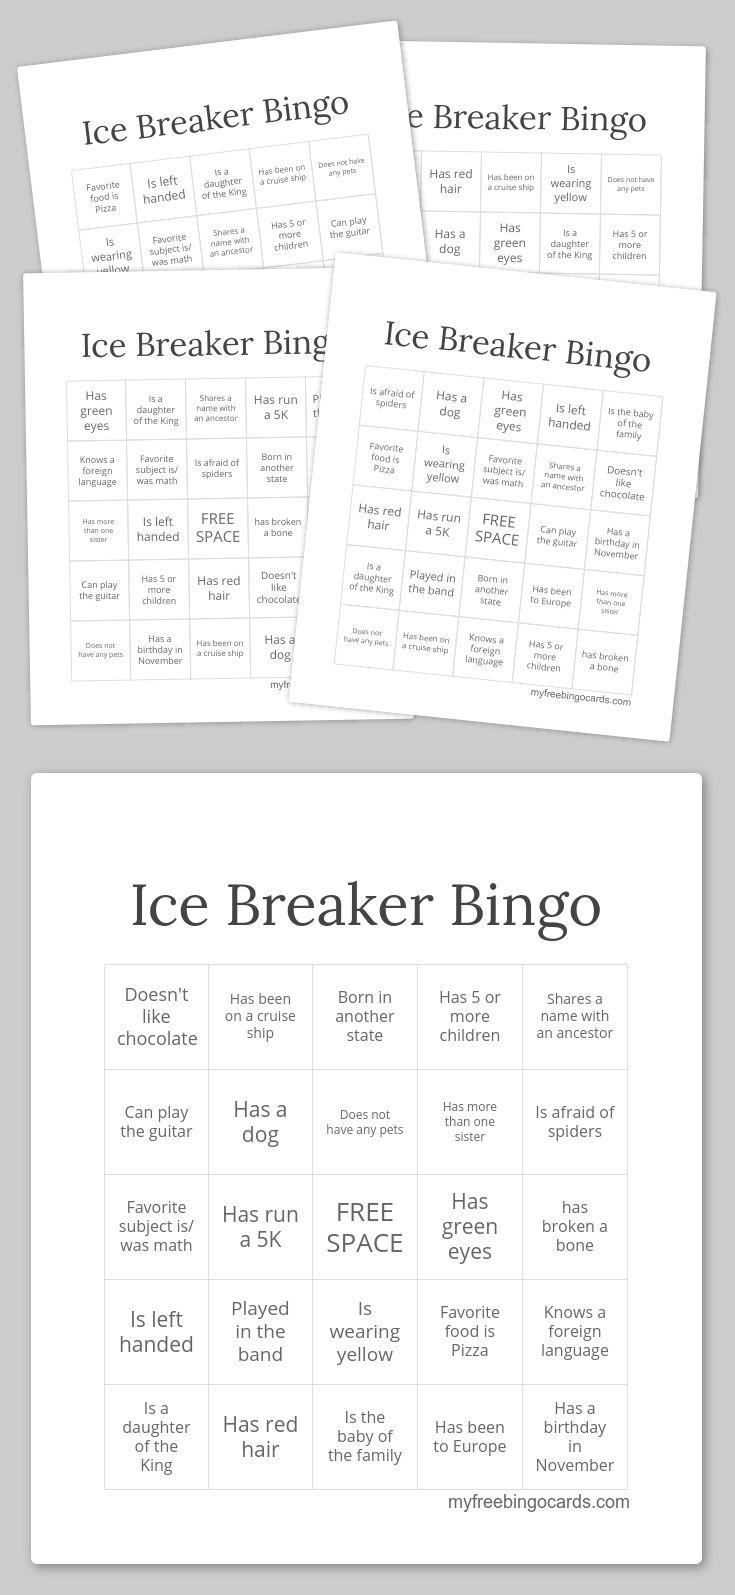 132 best bingo fun images on pinterest bingo cards for Ice breaker bingo template